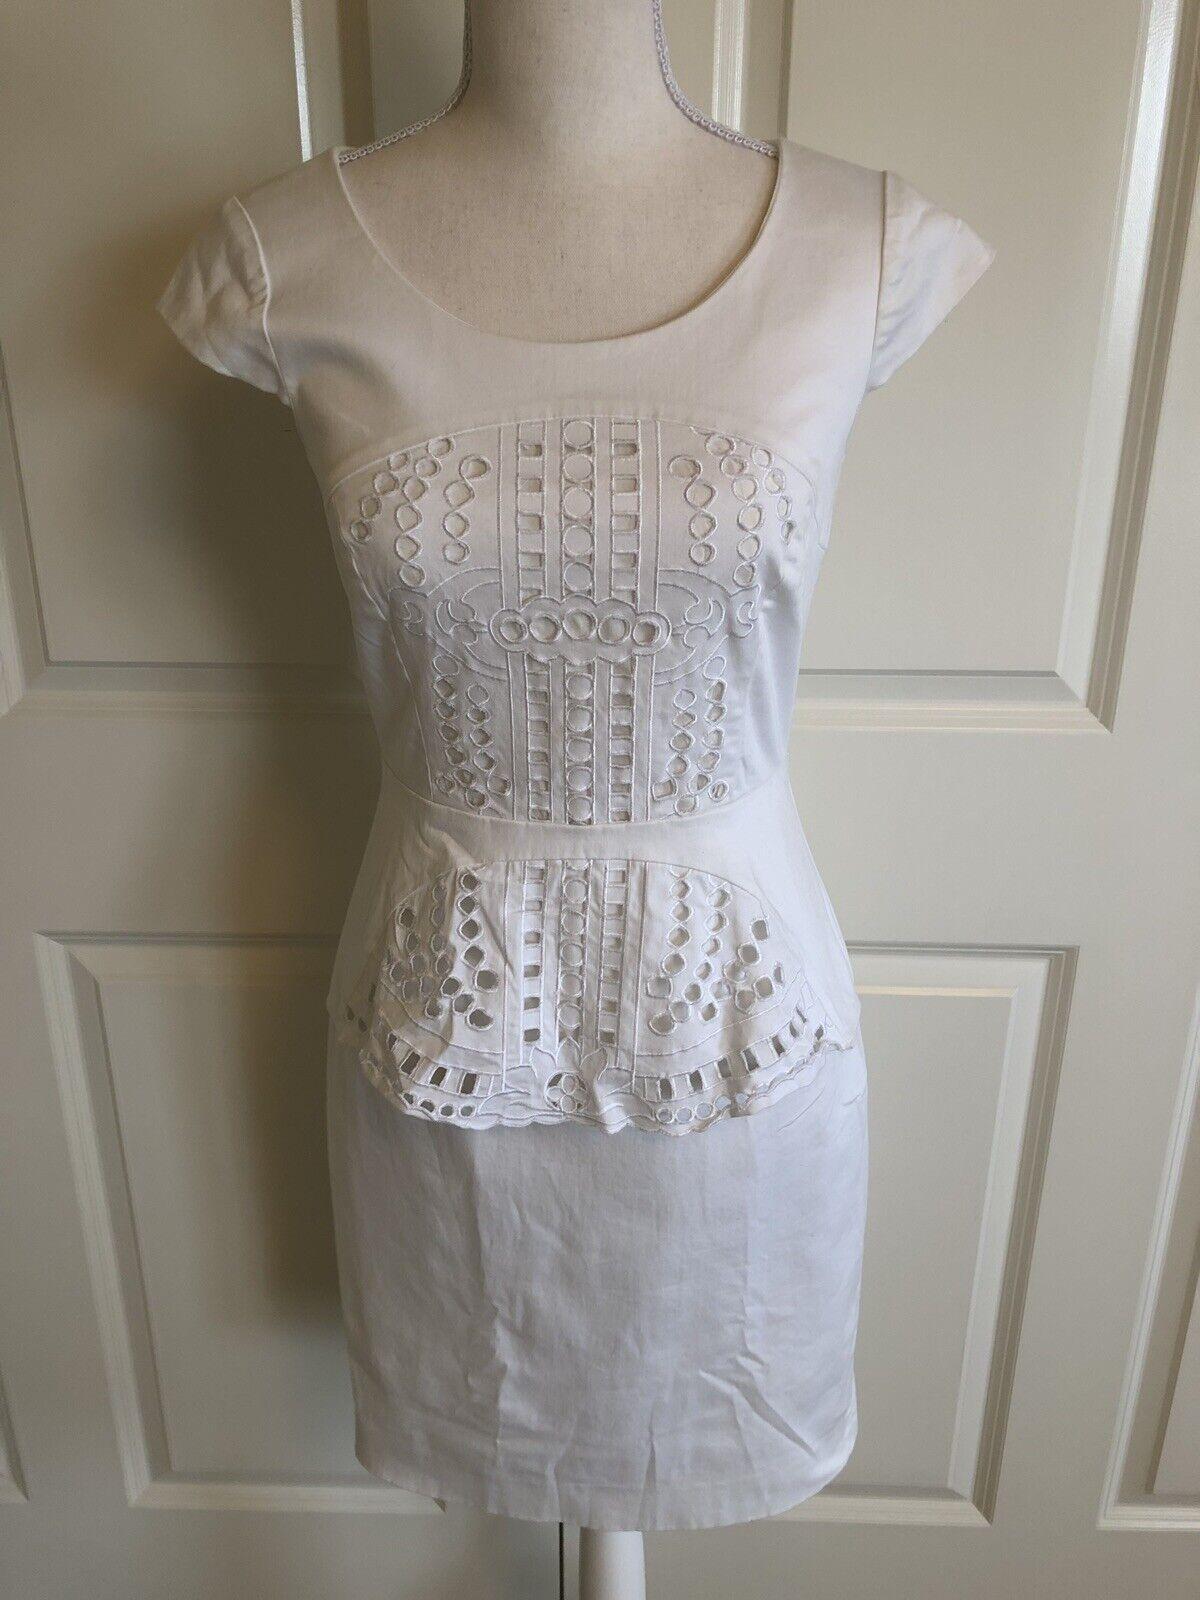 e15fc0e7e9 ... Antonio Melani White Peplum Dress Lined Size Size Size 2 c02fc5 ...